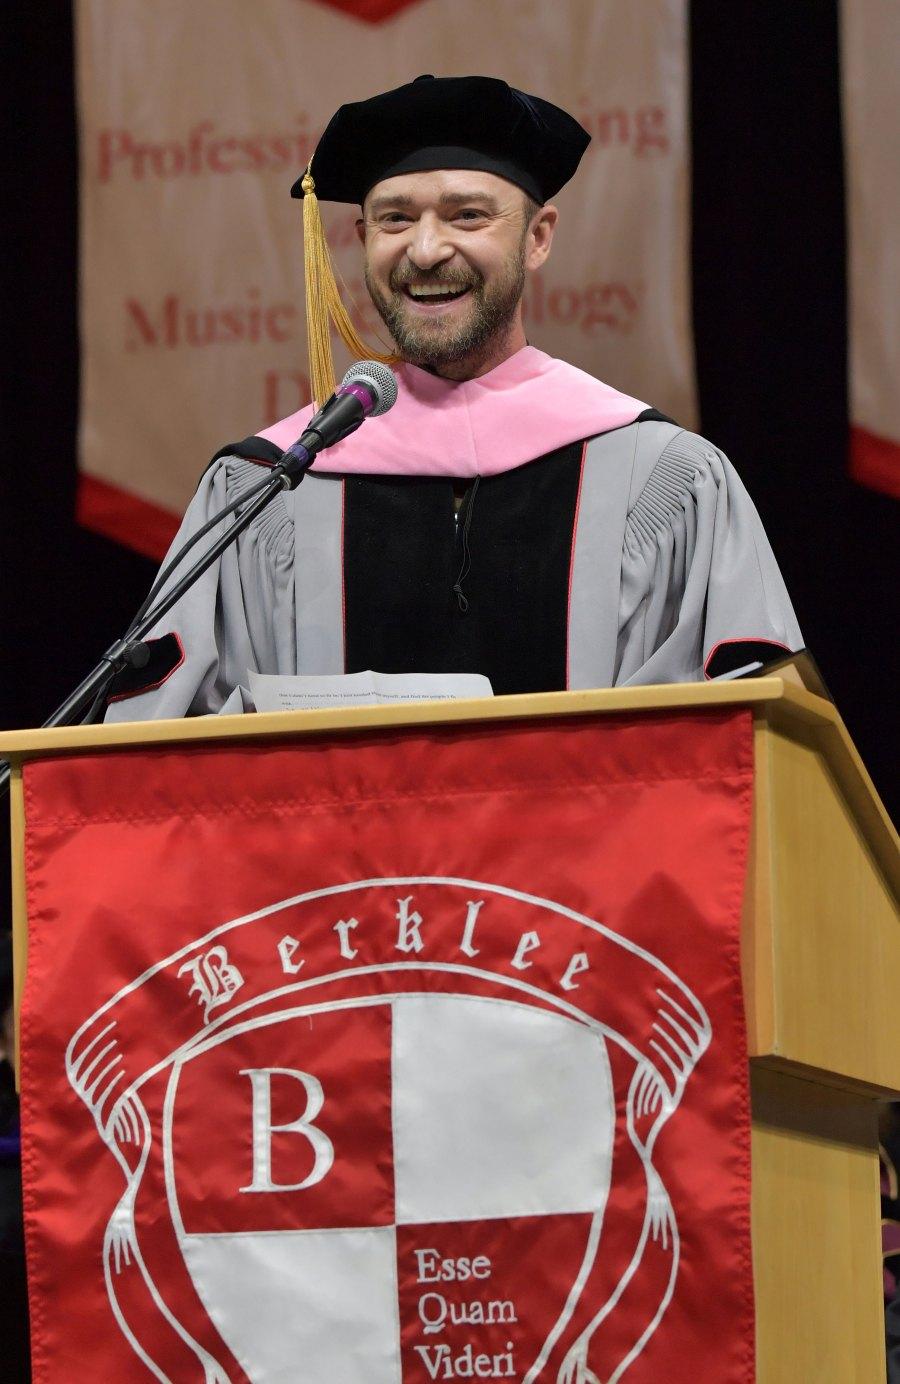 Justin Timberlake Stars With Honorary Degrees